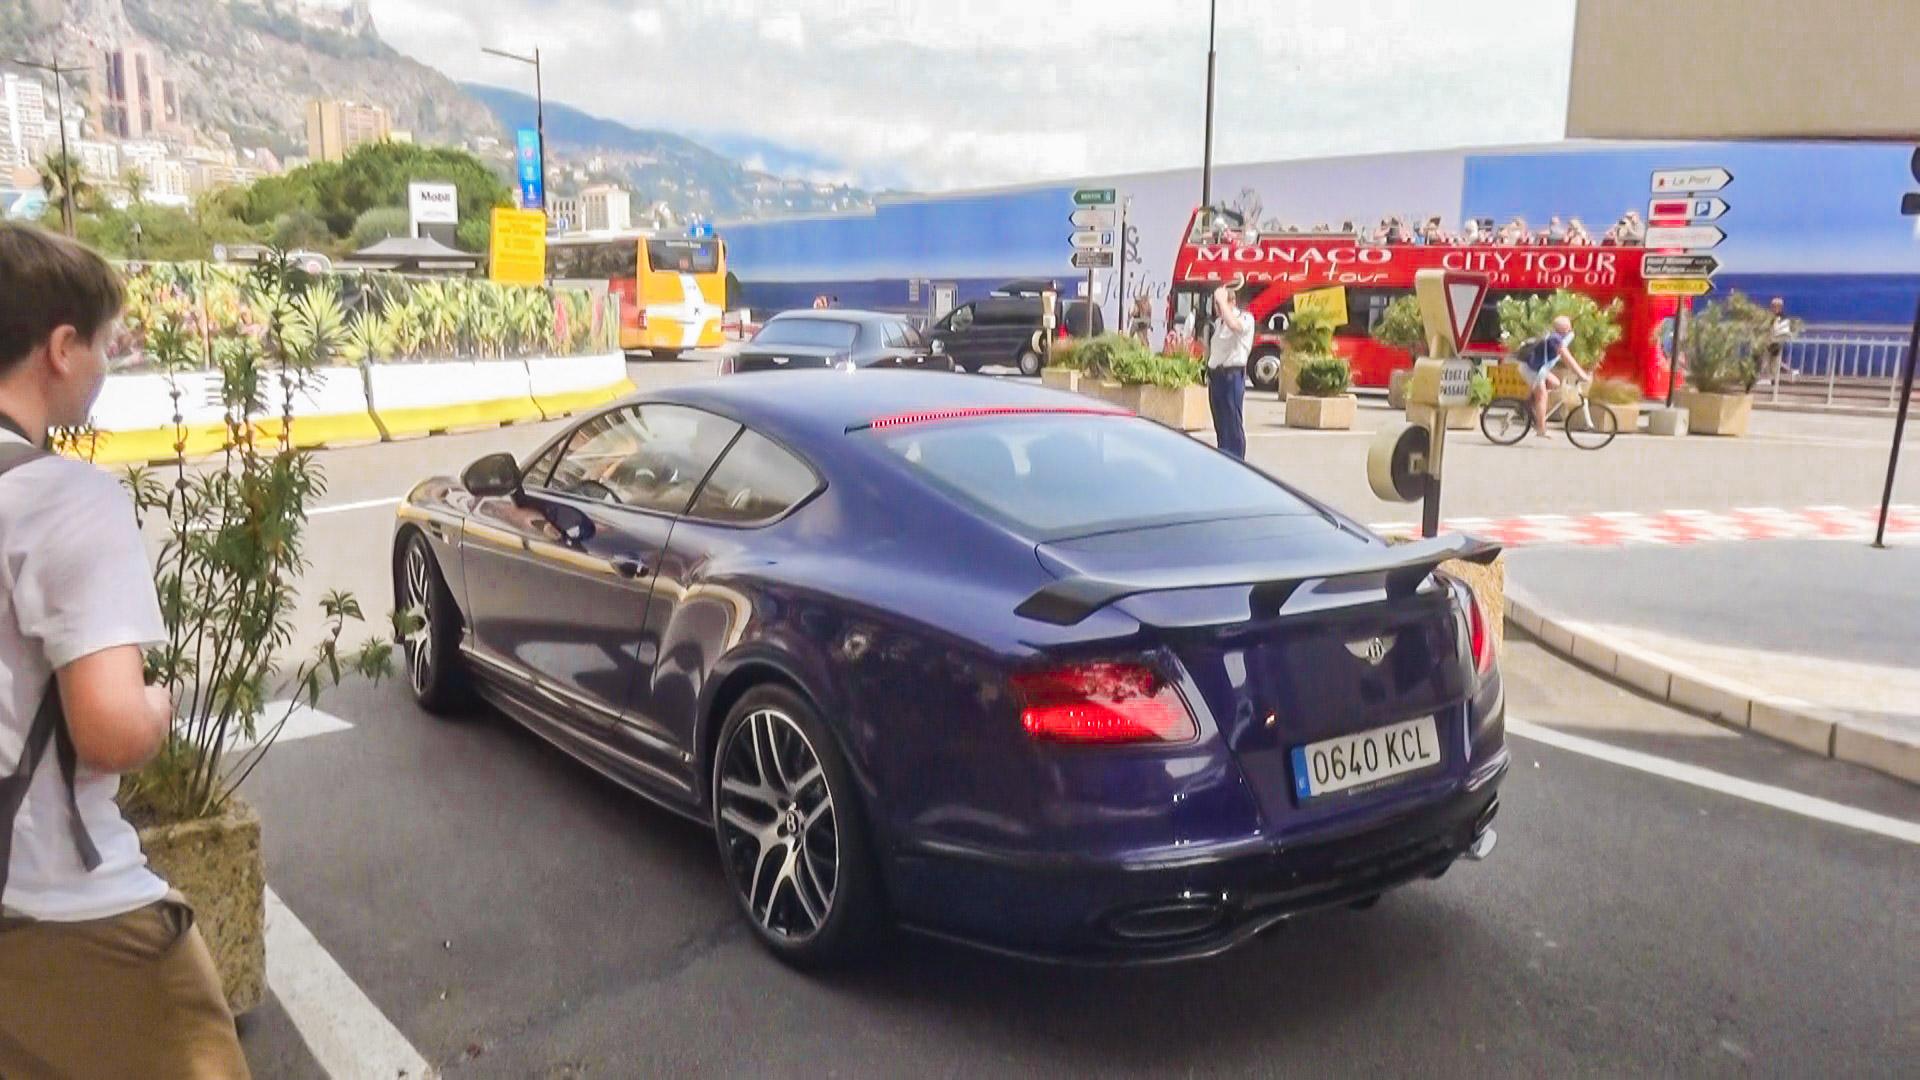 Bentley Continental GT Supersports - 0640-KCL (ESP)